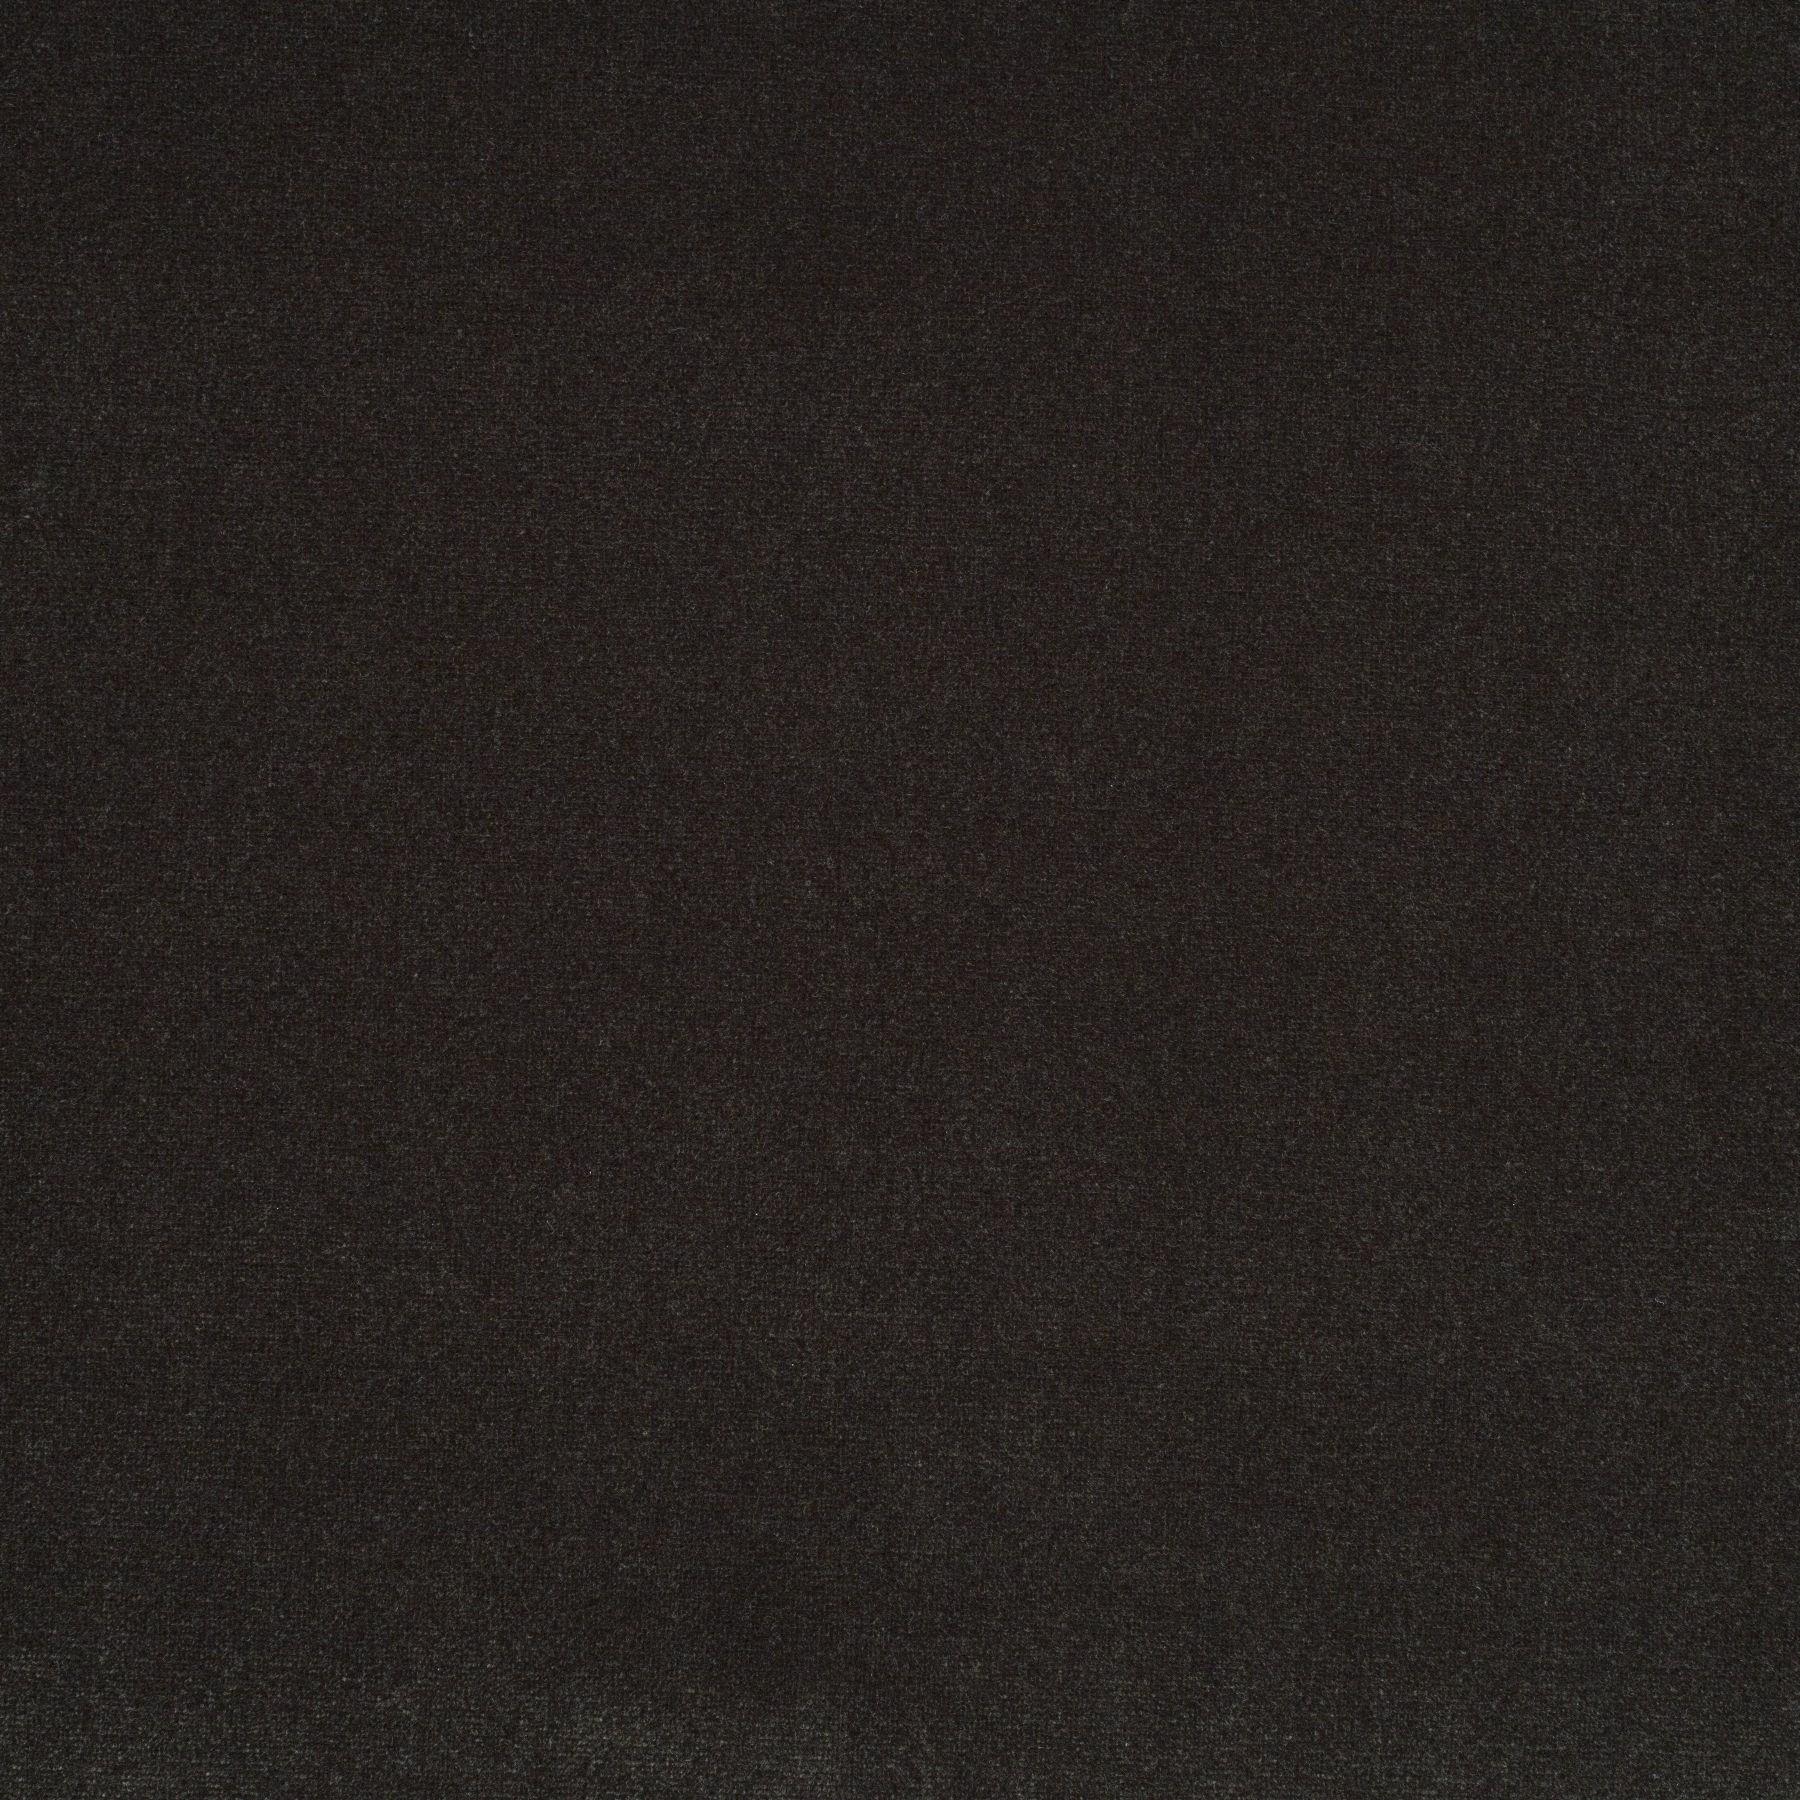 upholstery fabric orsay 1 3123 021 jab anstoetz fabrics. Black Bedroom Furniture Sets. Home Design Ideas